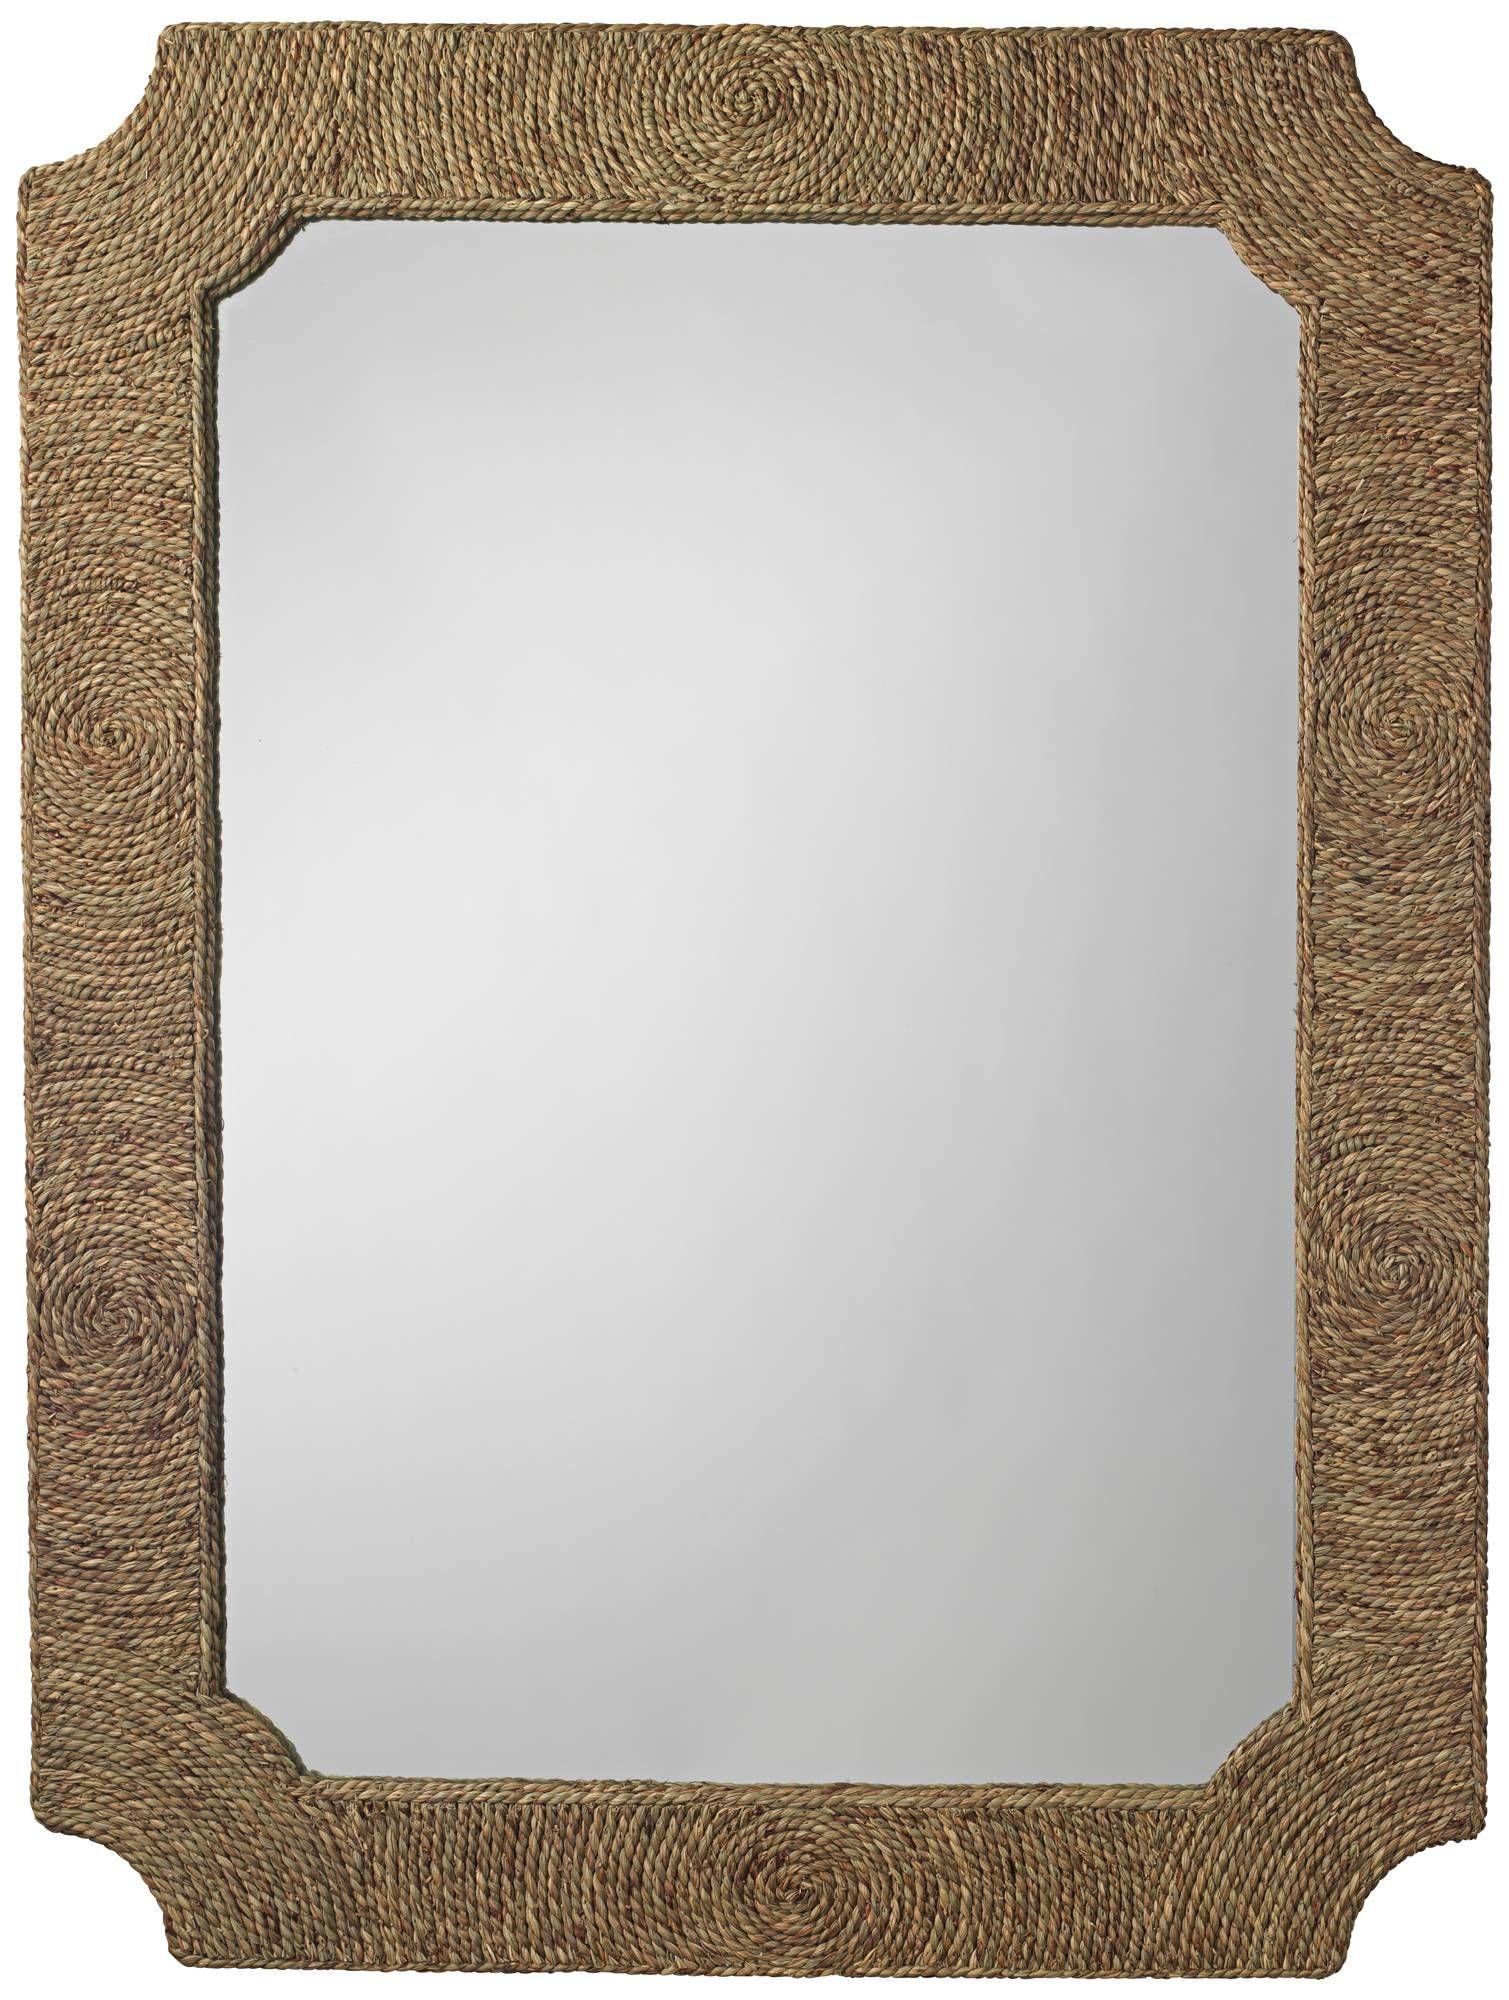 Jamie Young Marina Seagrass 36 X 48 Wall Mirror 19t85 Lamps Plus Mirror Wall Mirror Crafts Mirror 36 x 48 framed mirror